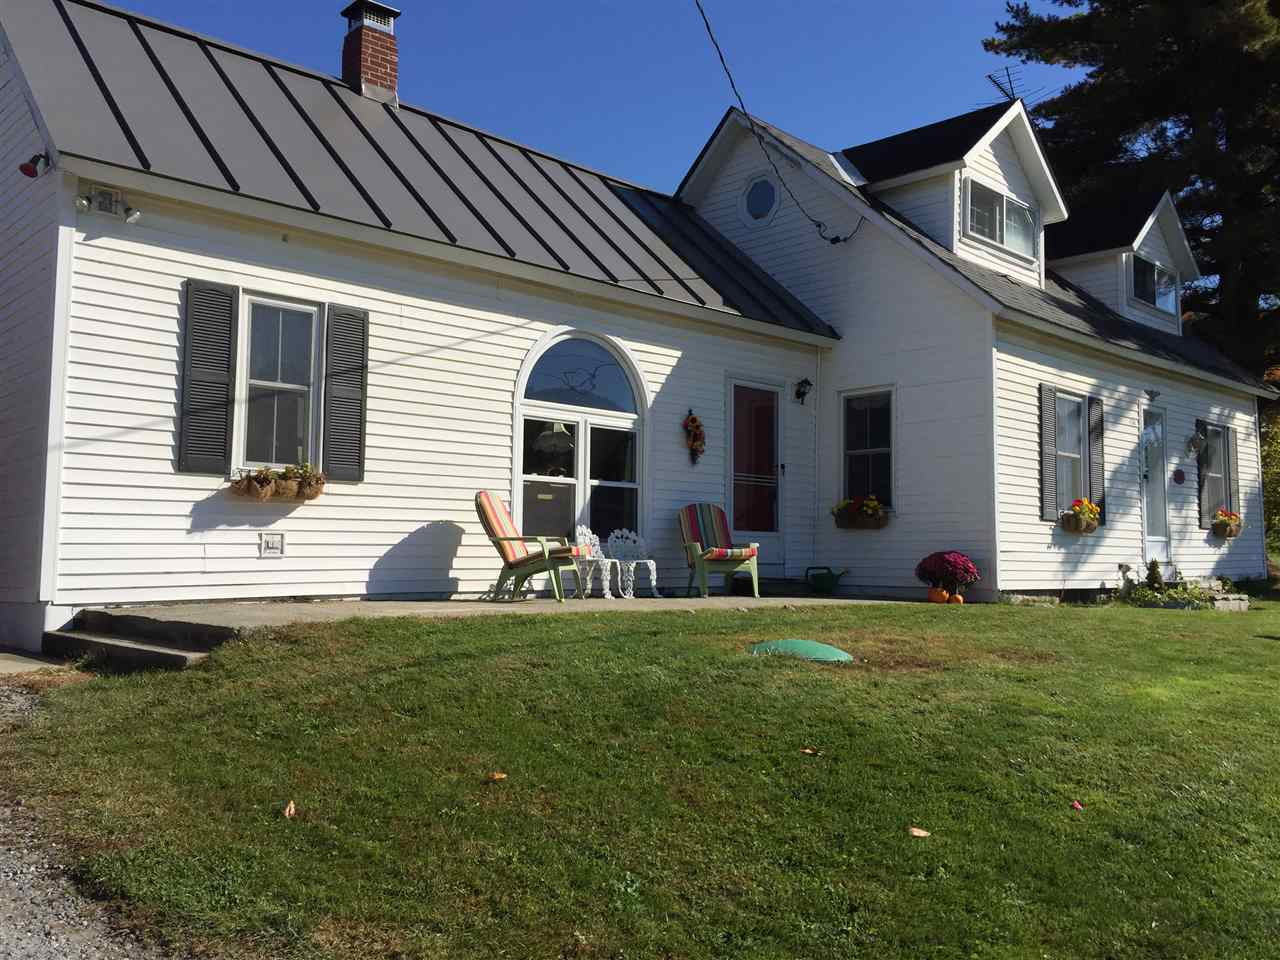 244 Vermont Route 15, Danville, VT - USA (photo 2)